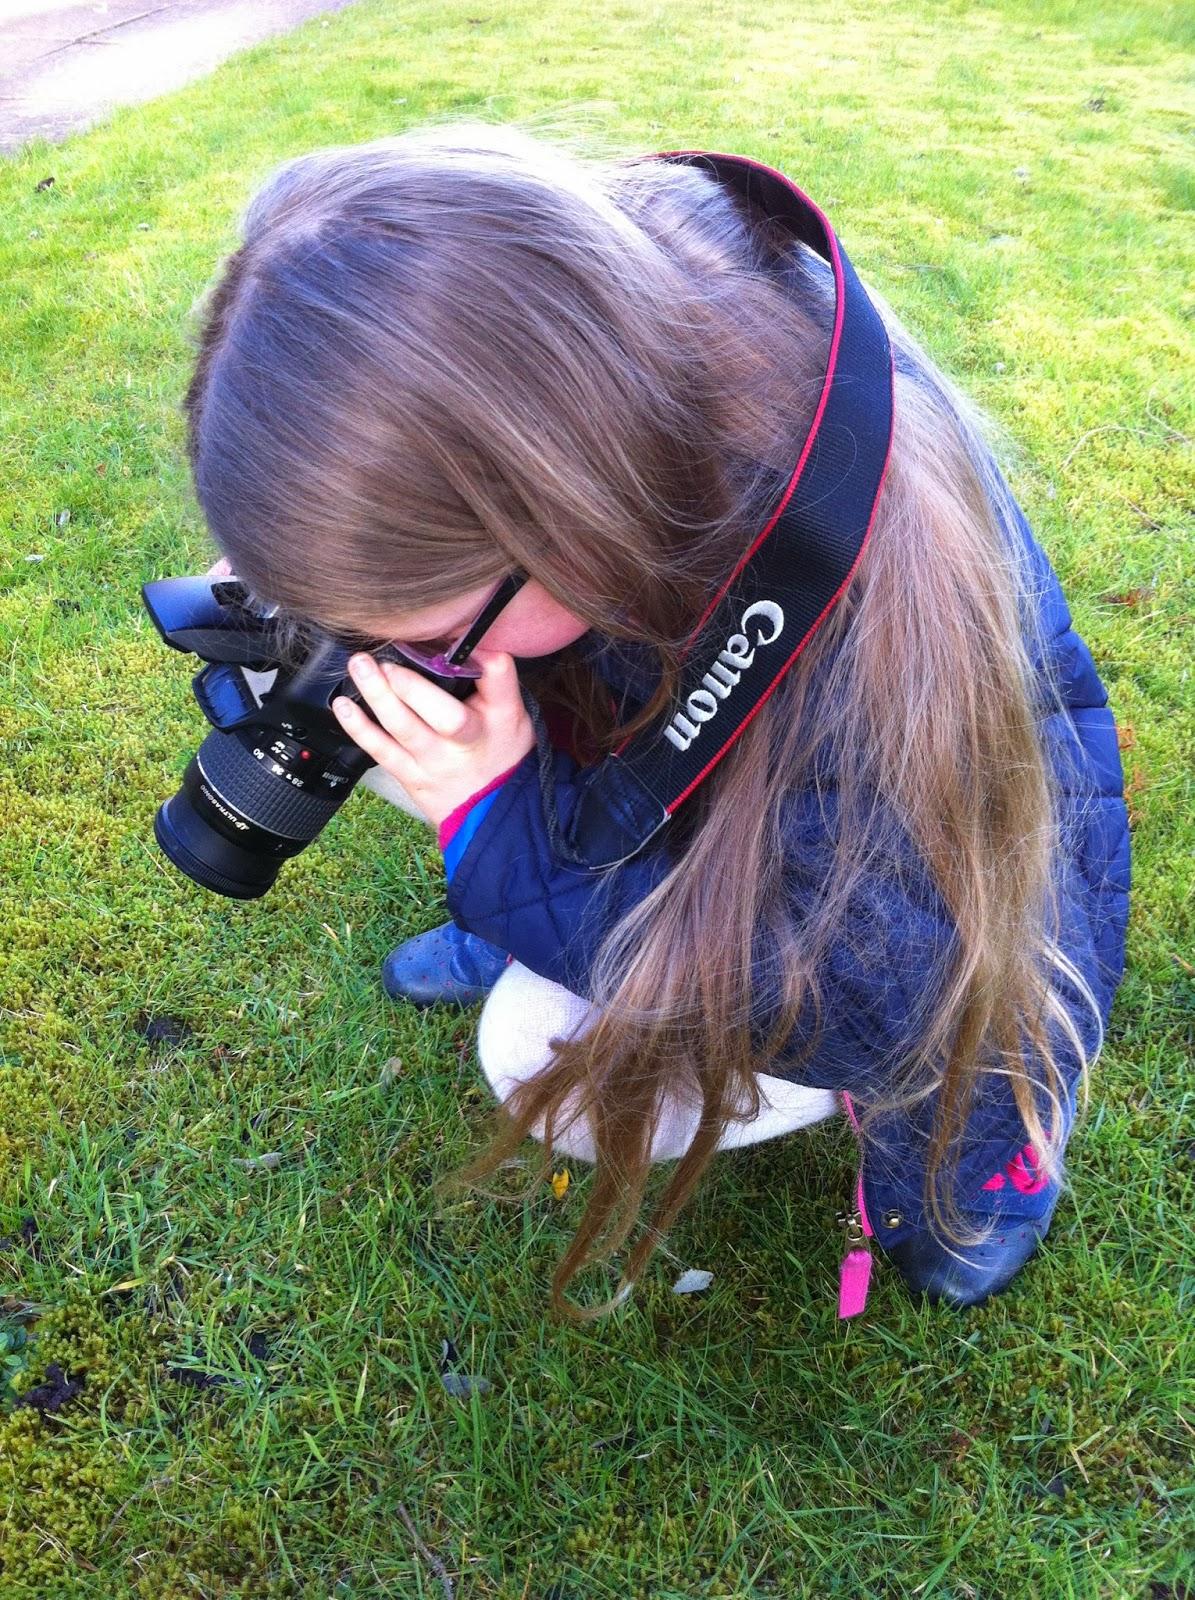 Daughter-camera-spring-365